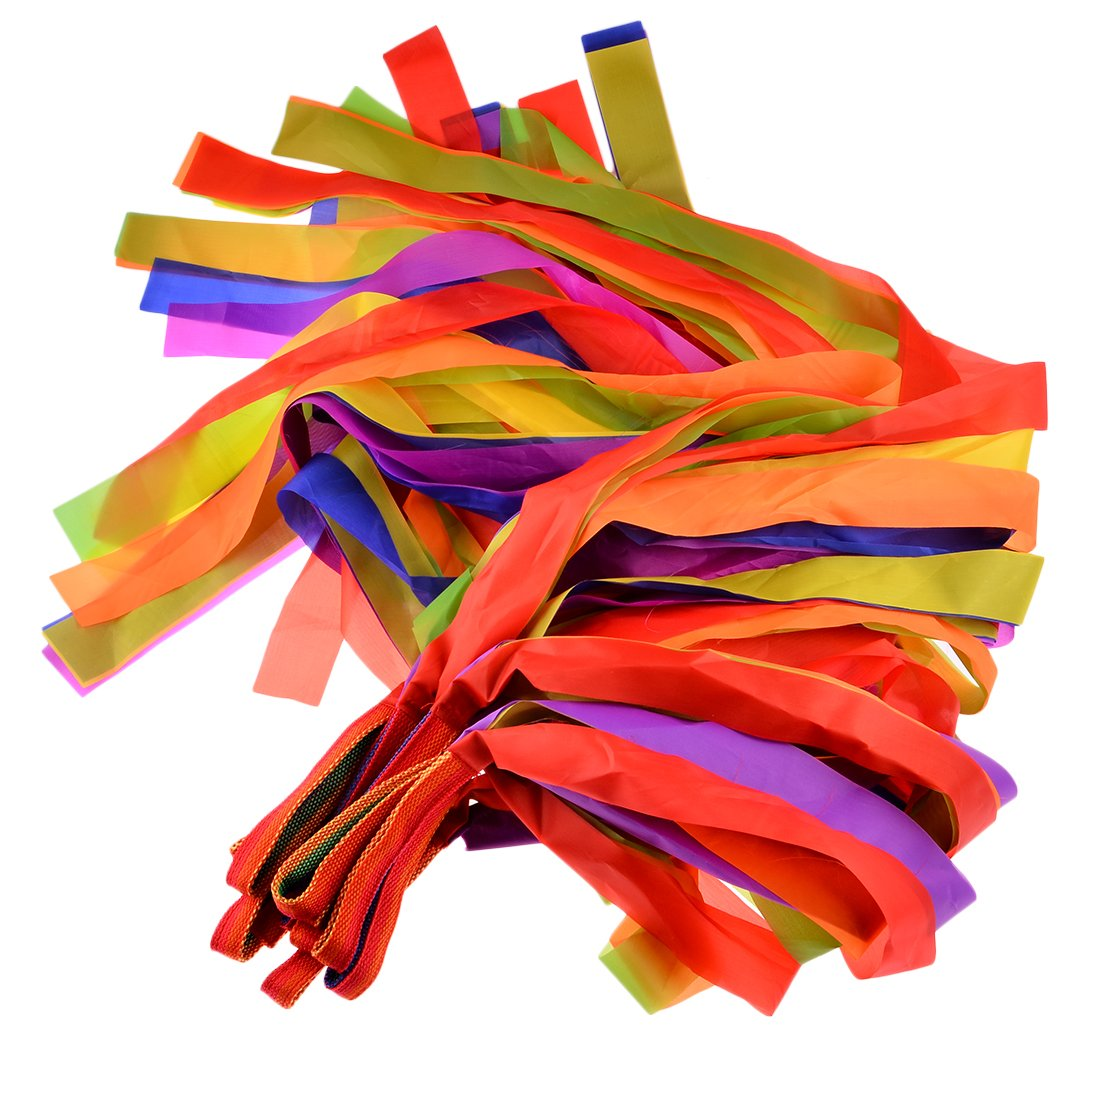 Rhythm Ribbon Dance, WOLFBUSH 12Pcs Hand Held Dance Rainbow Ribbons Set for Kids Children - Color Random